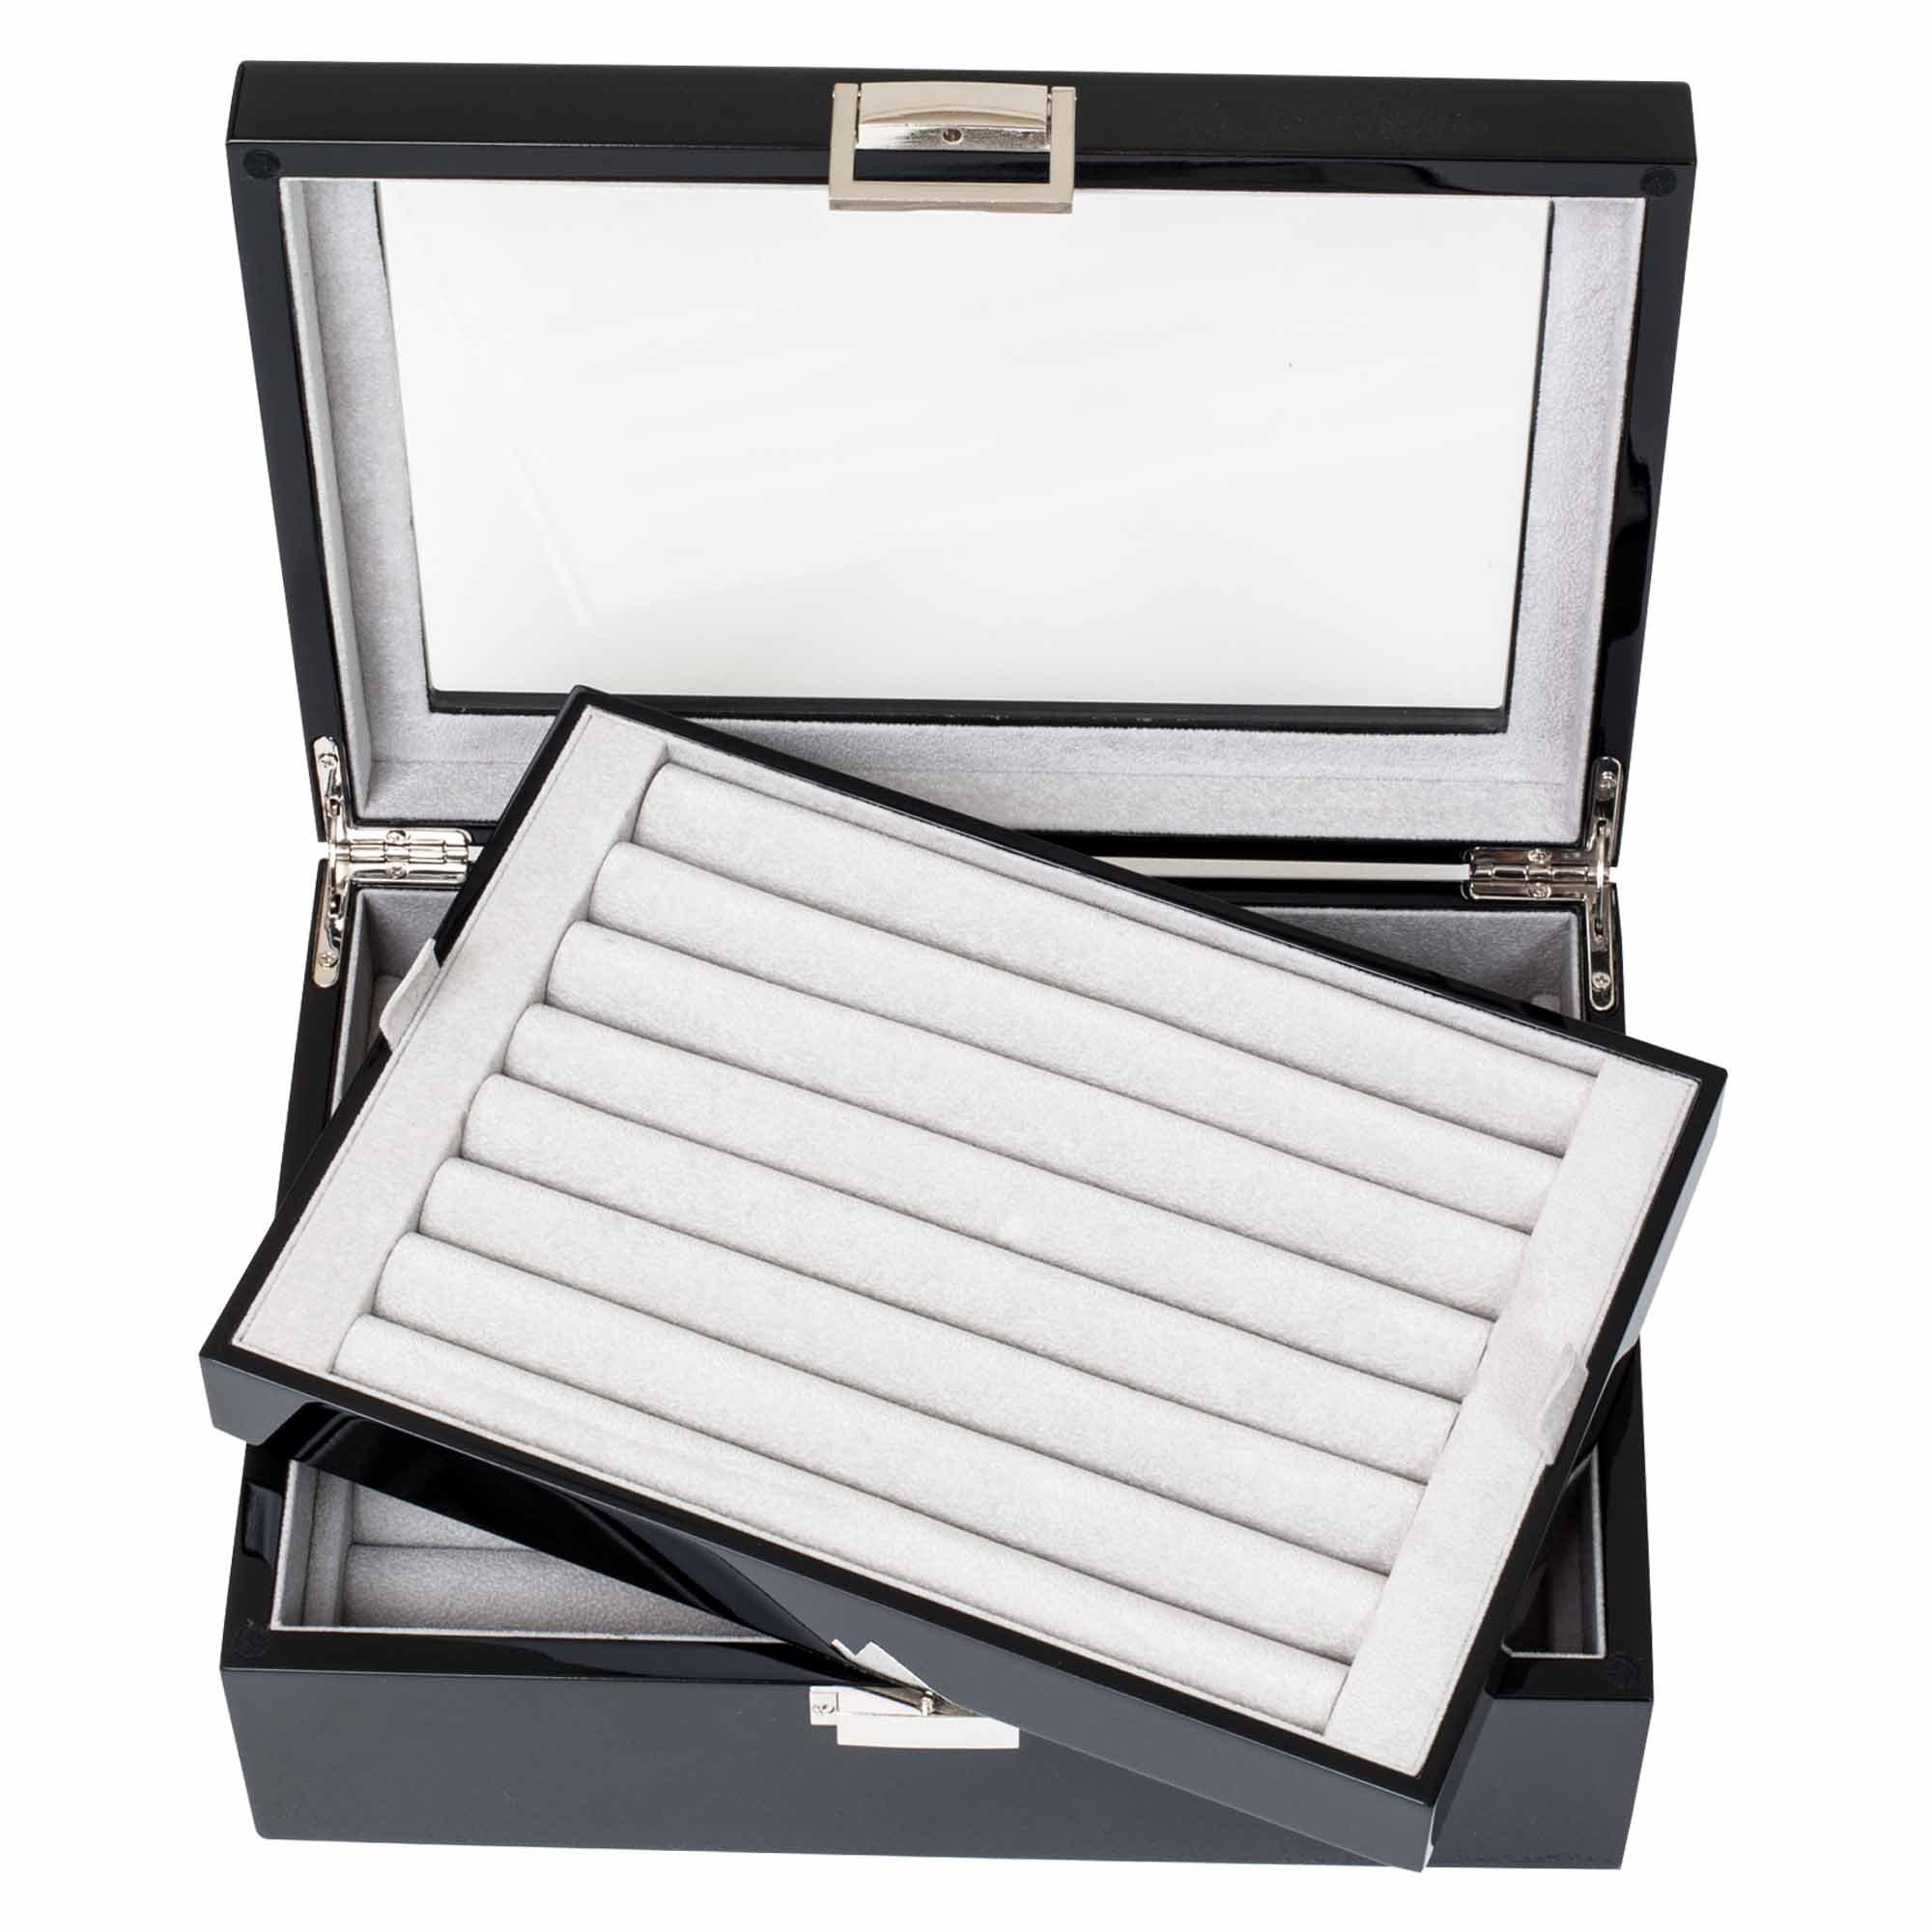 Black Double Layer Jewelry Cufflinks Storage Presentation Box / Case by Cuff-Daddy